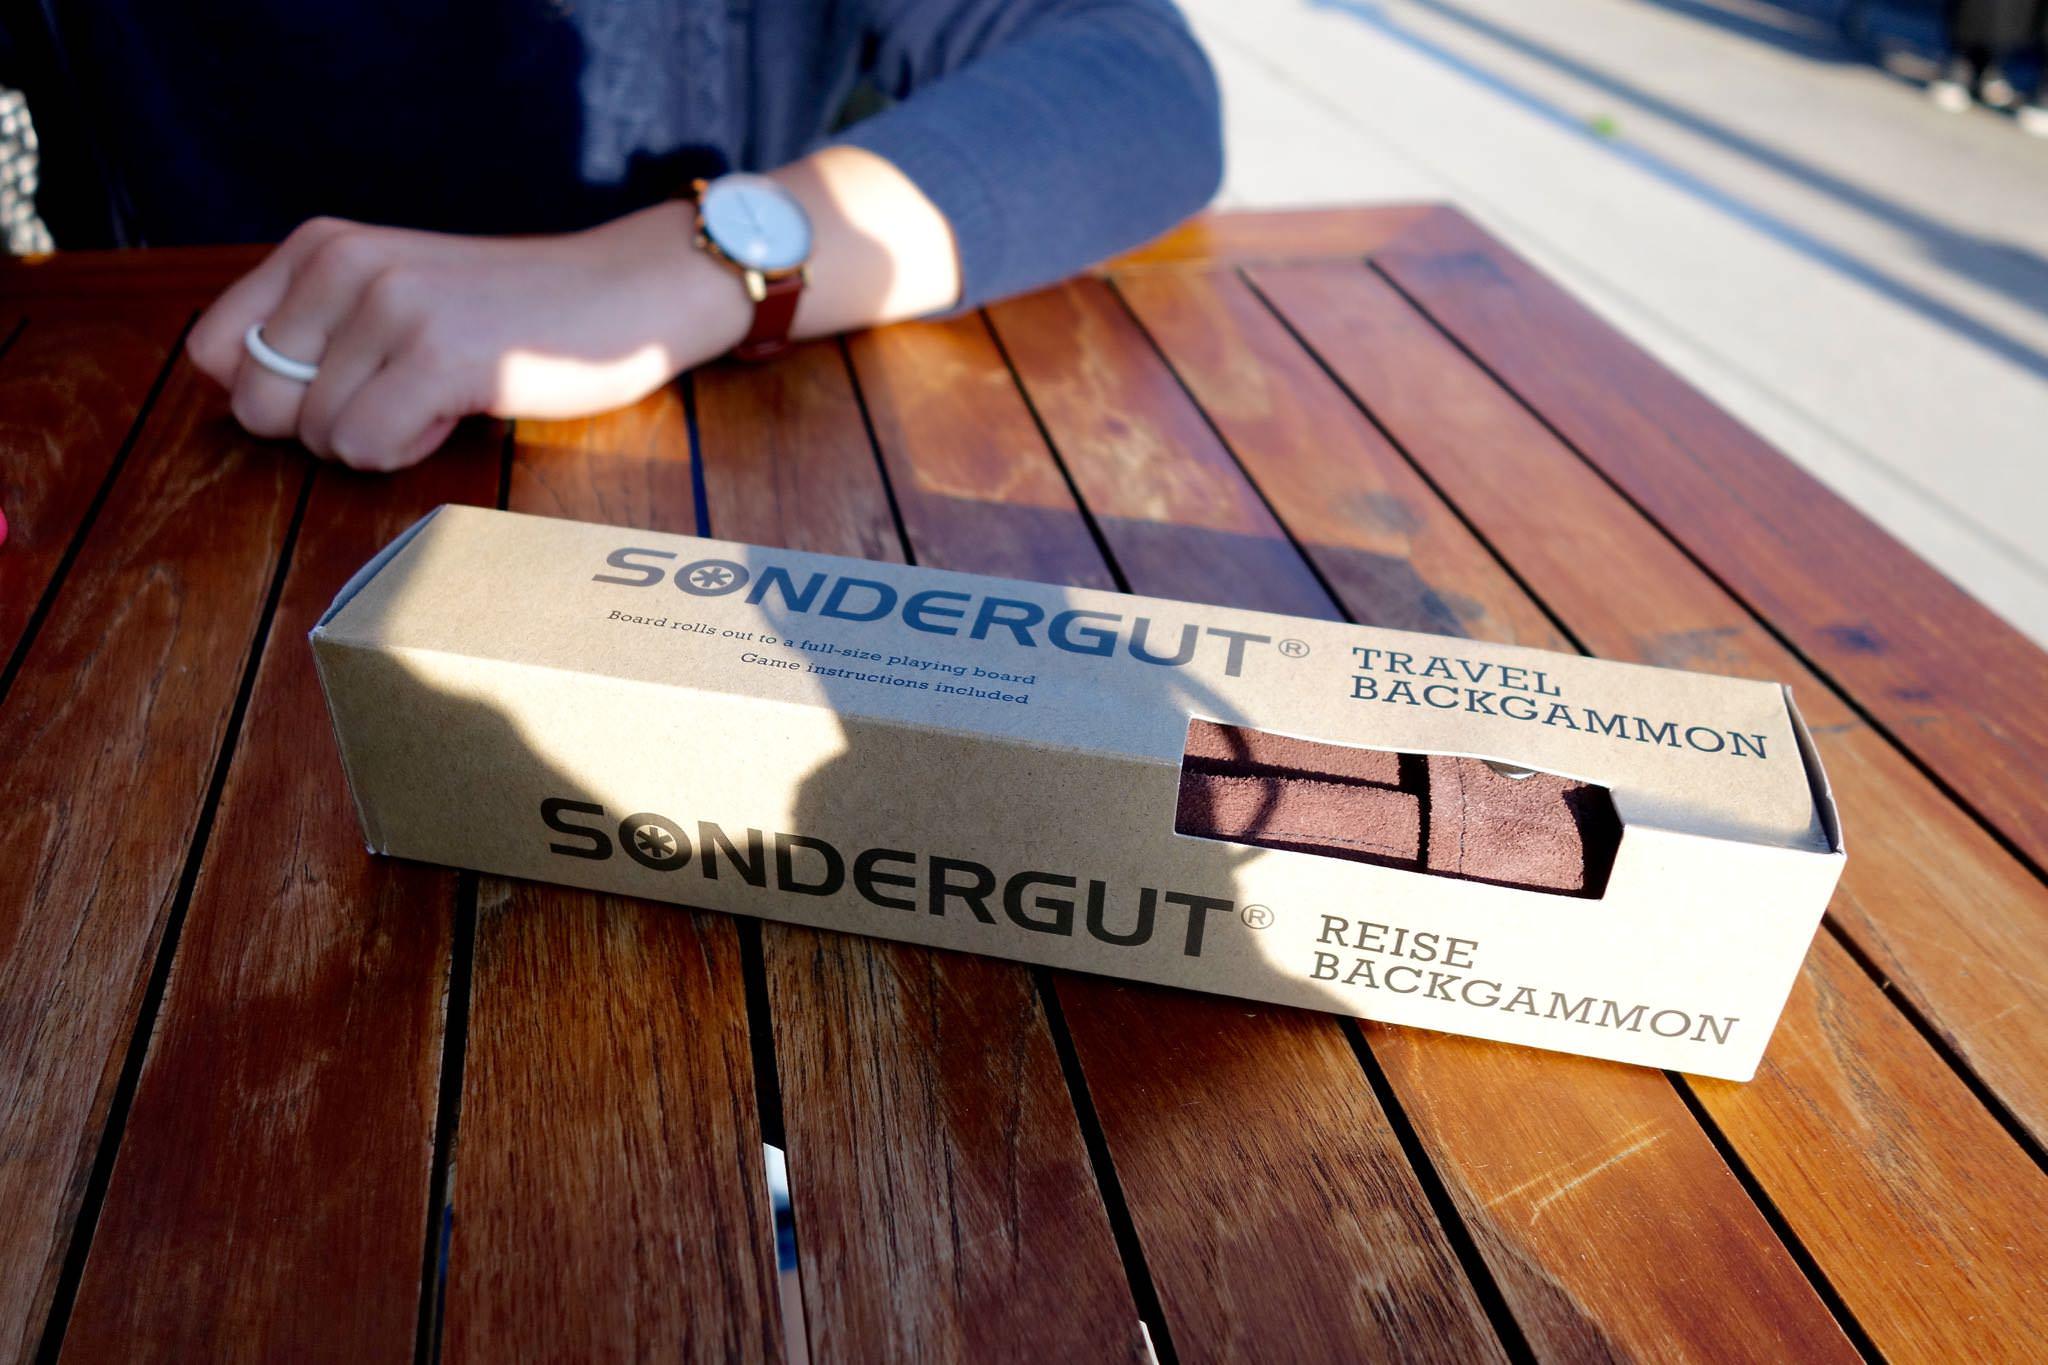 Sondergut Backgammon - 1